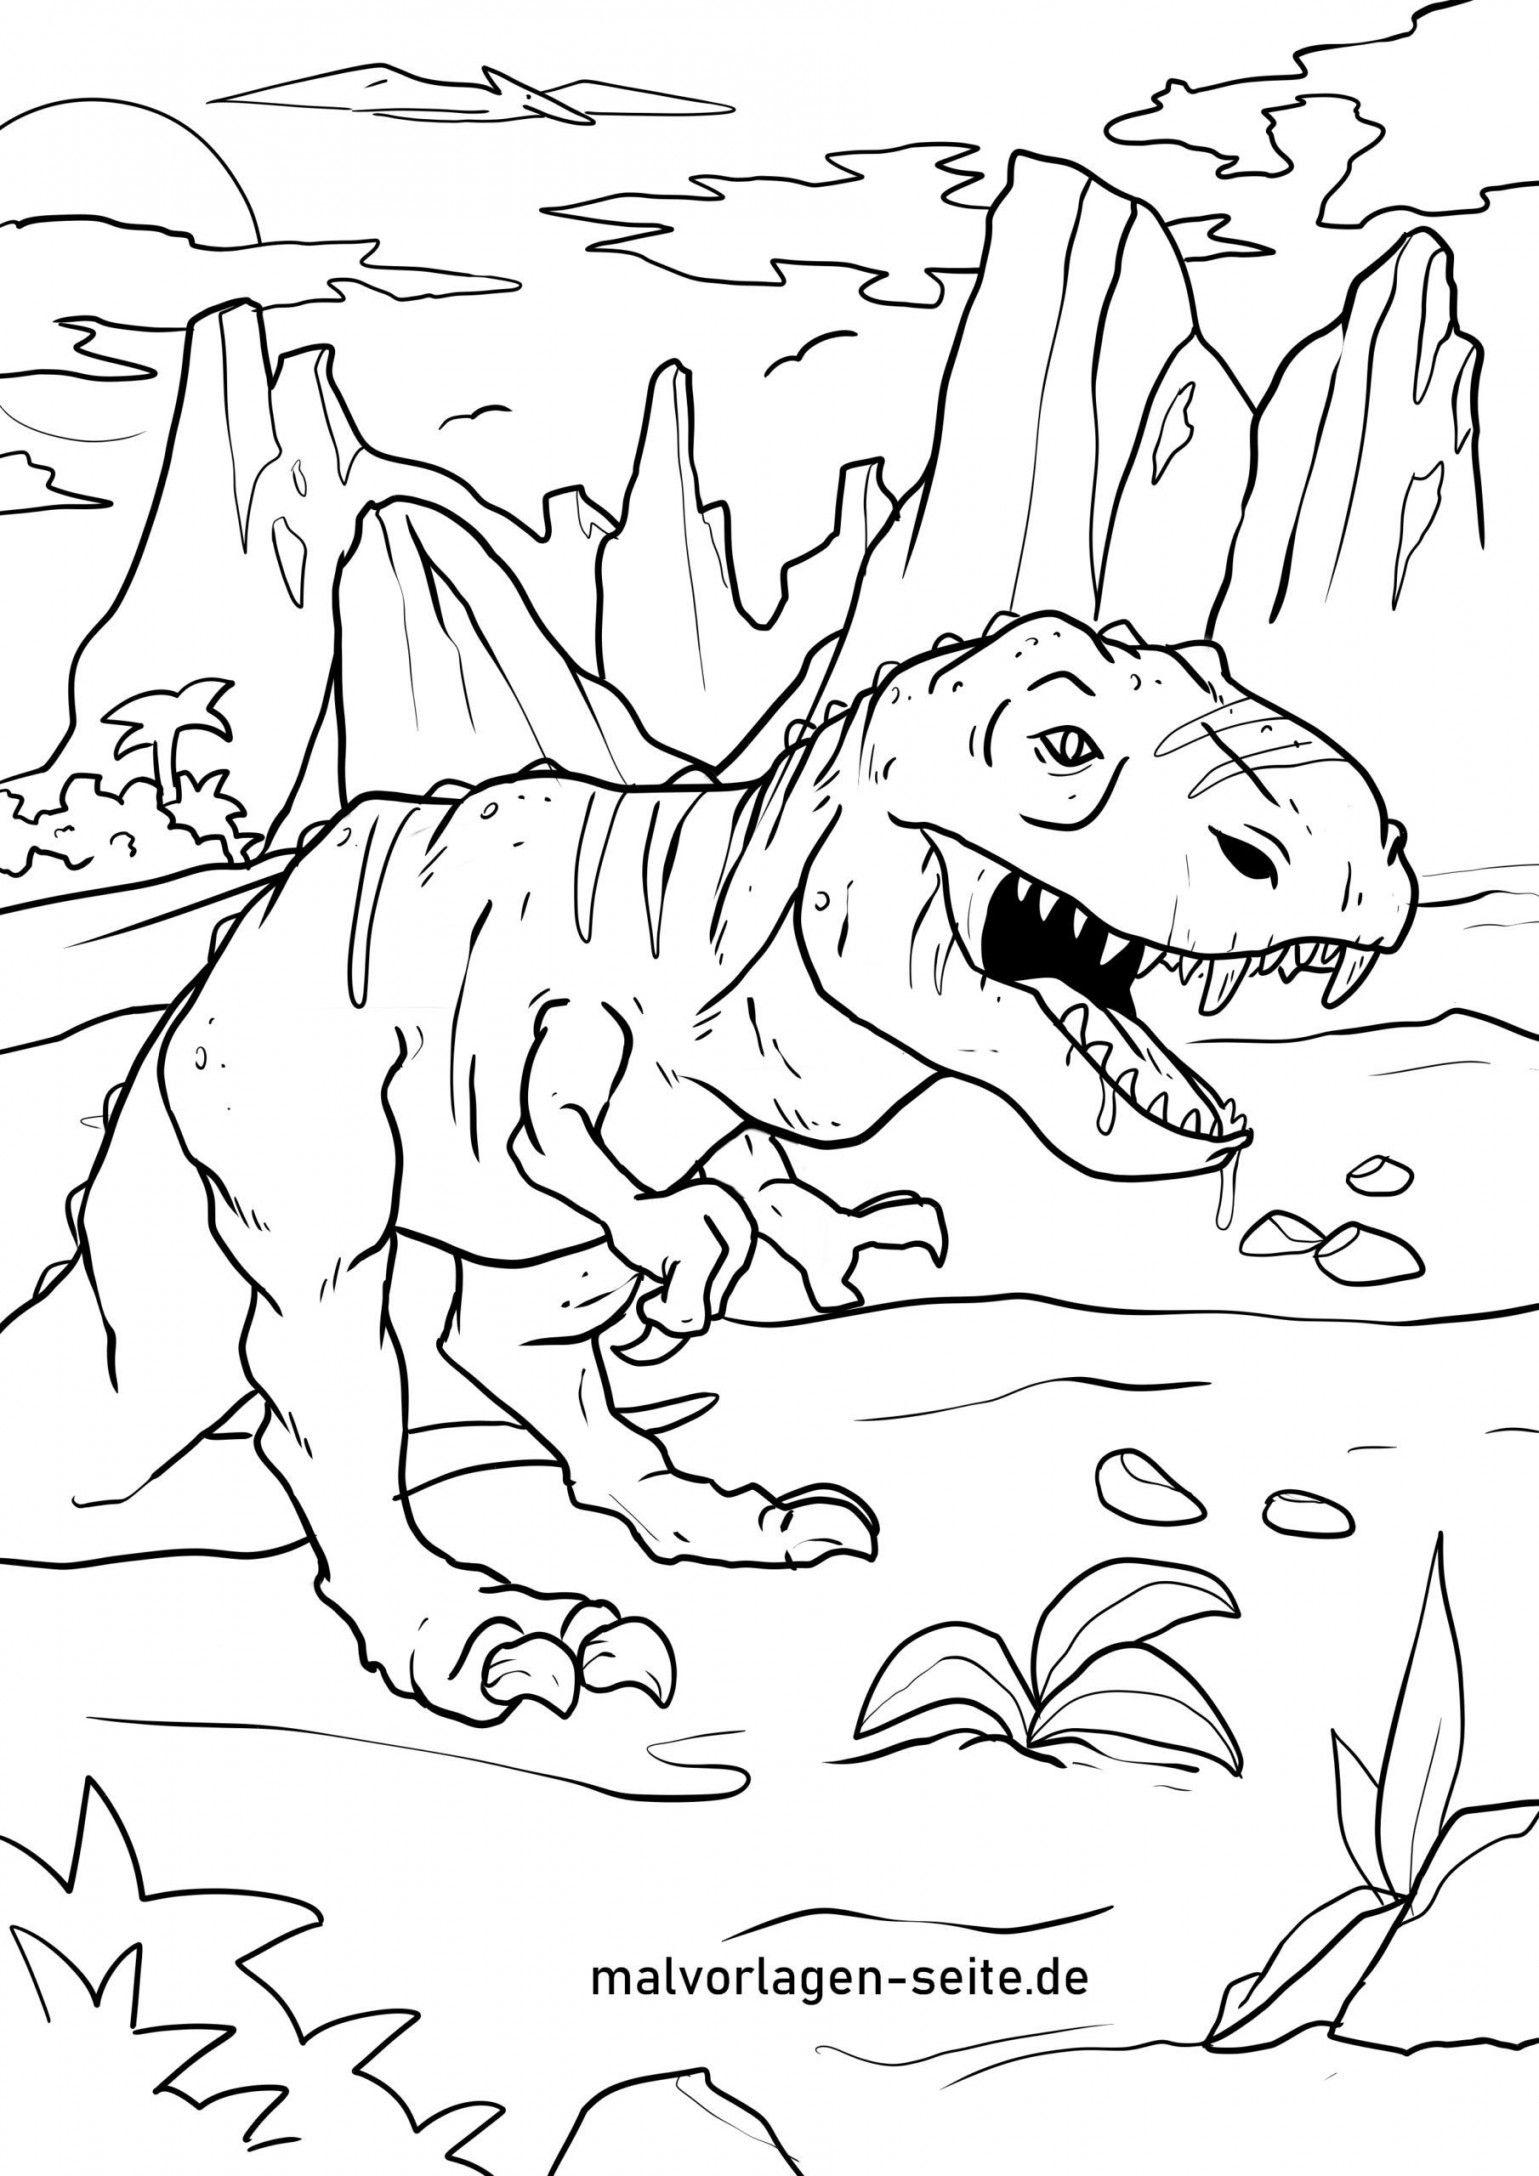 Dinosaurier Rex Zum Ausmalen Cosmixproject Com Dinosaur Pictures Dinosaur Coloring Pages Dinosaur Coloring